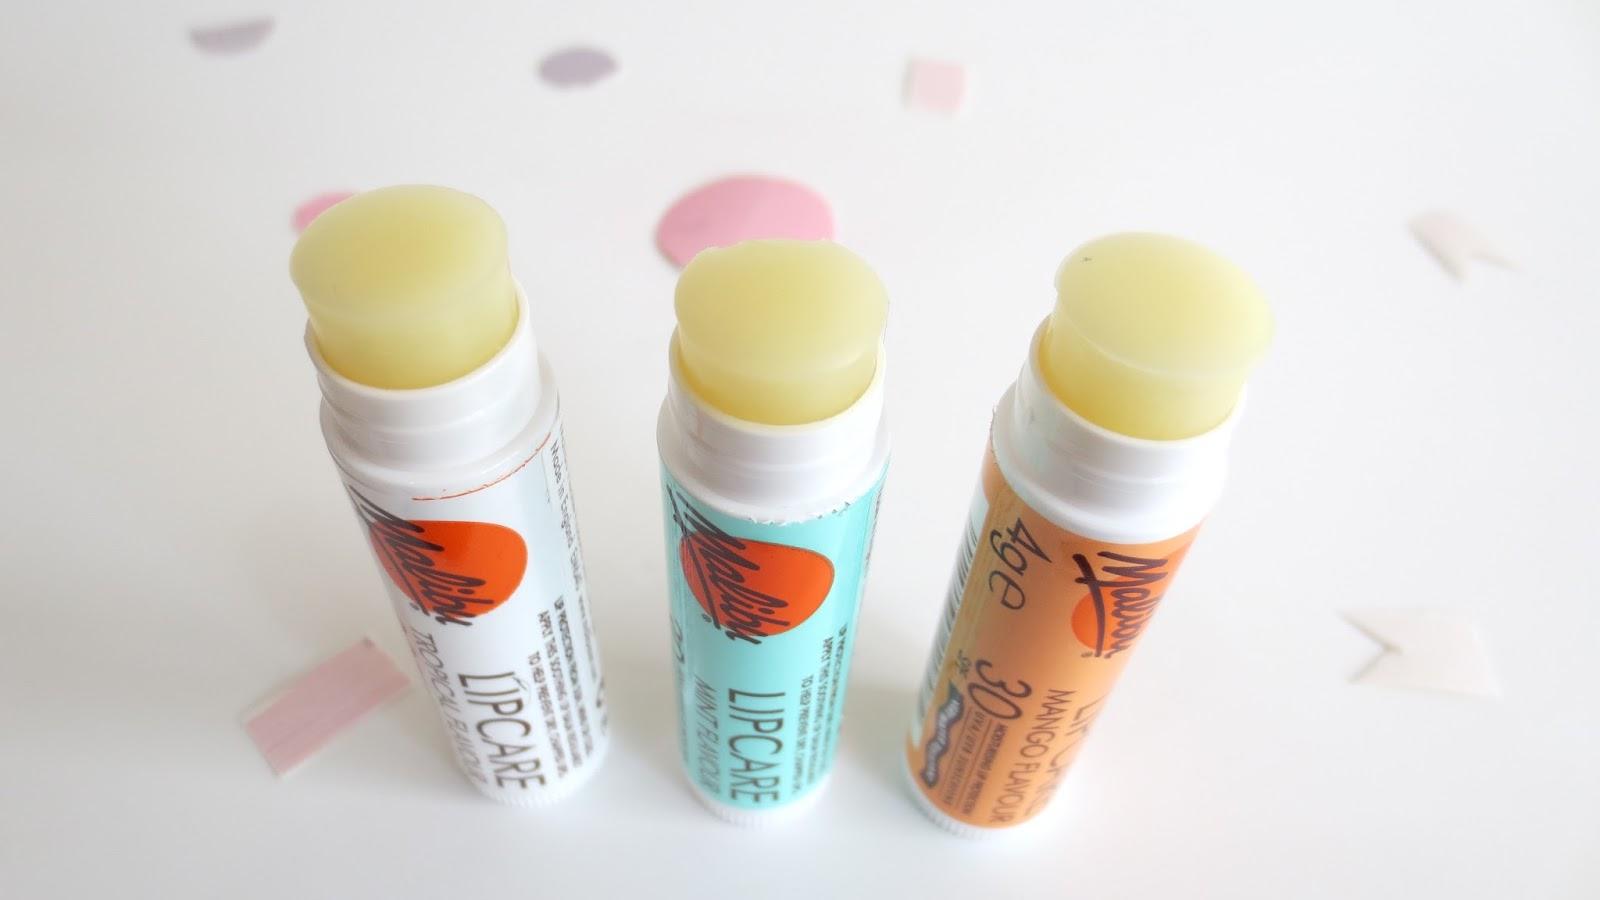 Malibu lip care 3 pk pack balms